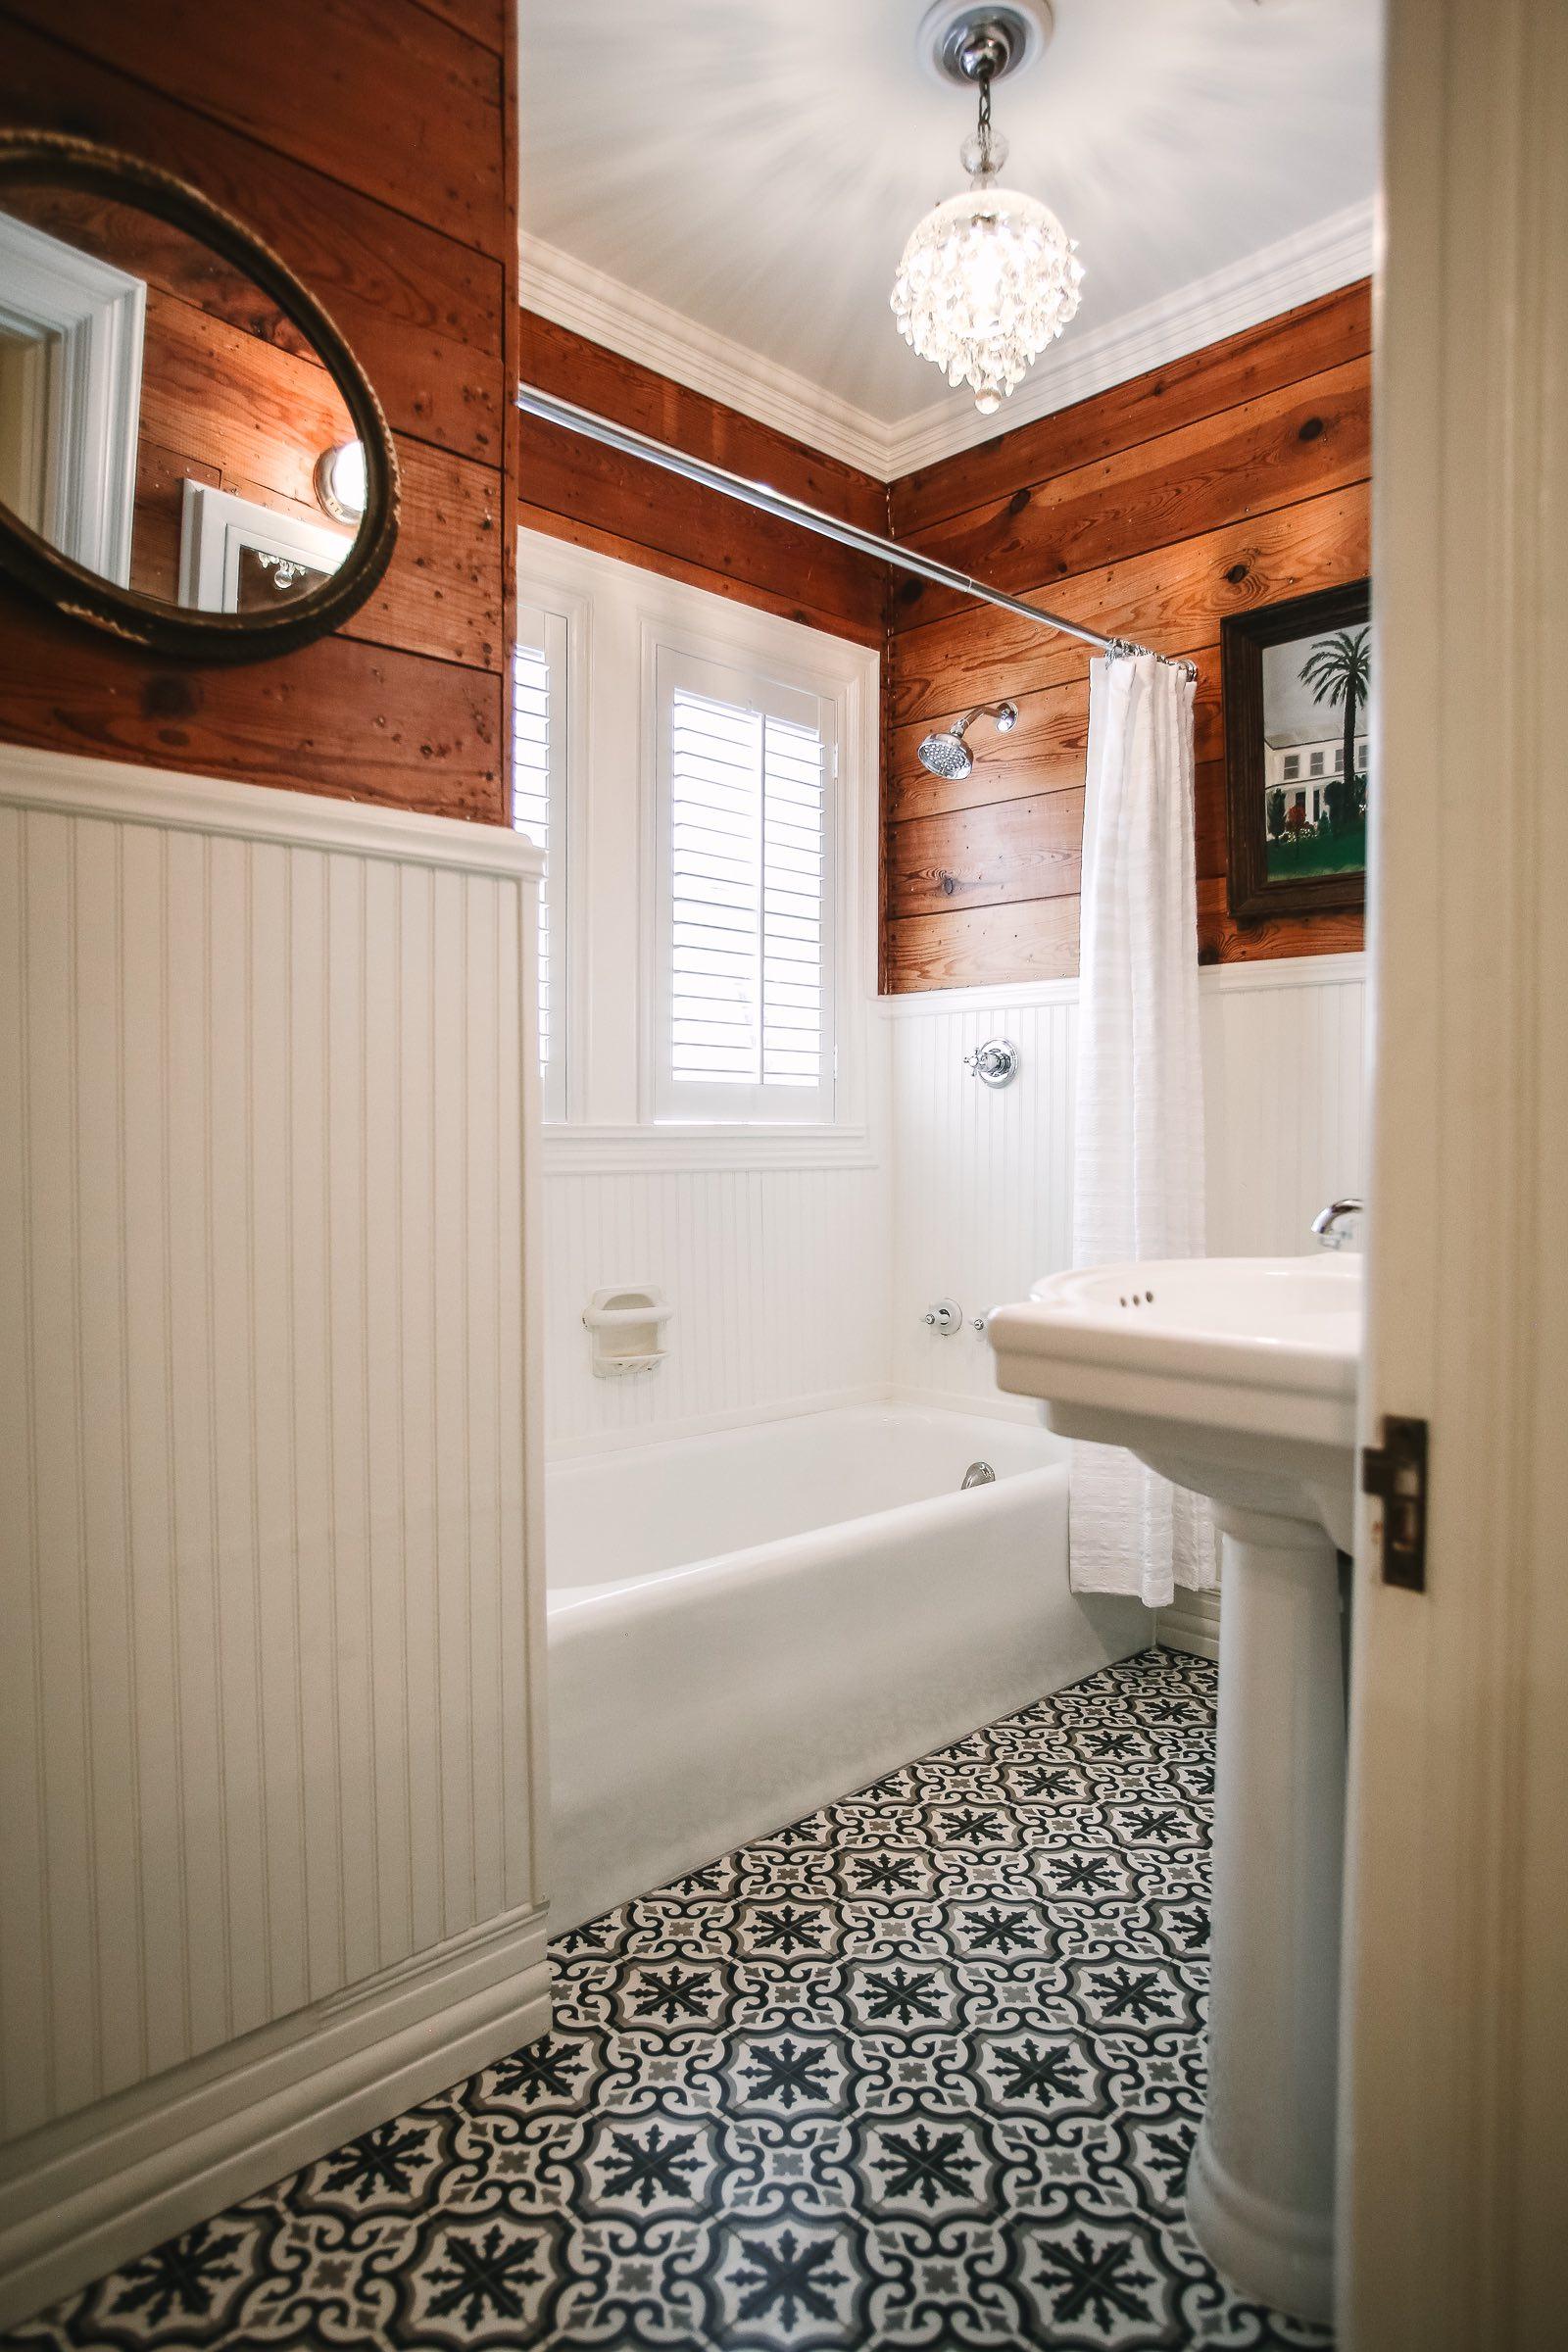 bathroom-remodel-shiplap-concrete-tile.jpg